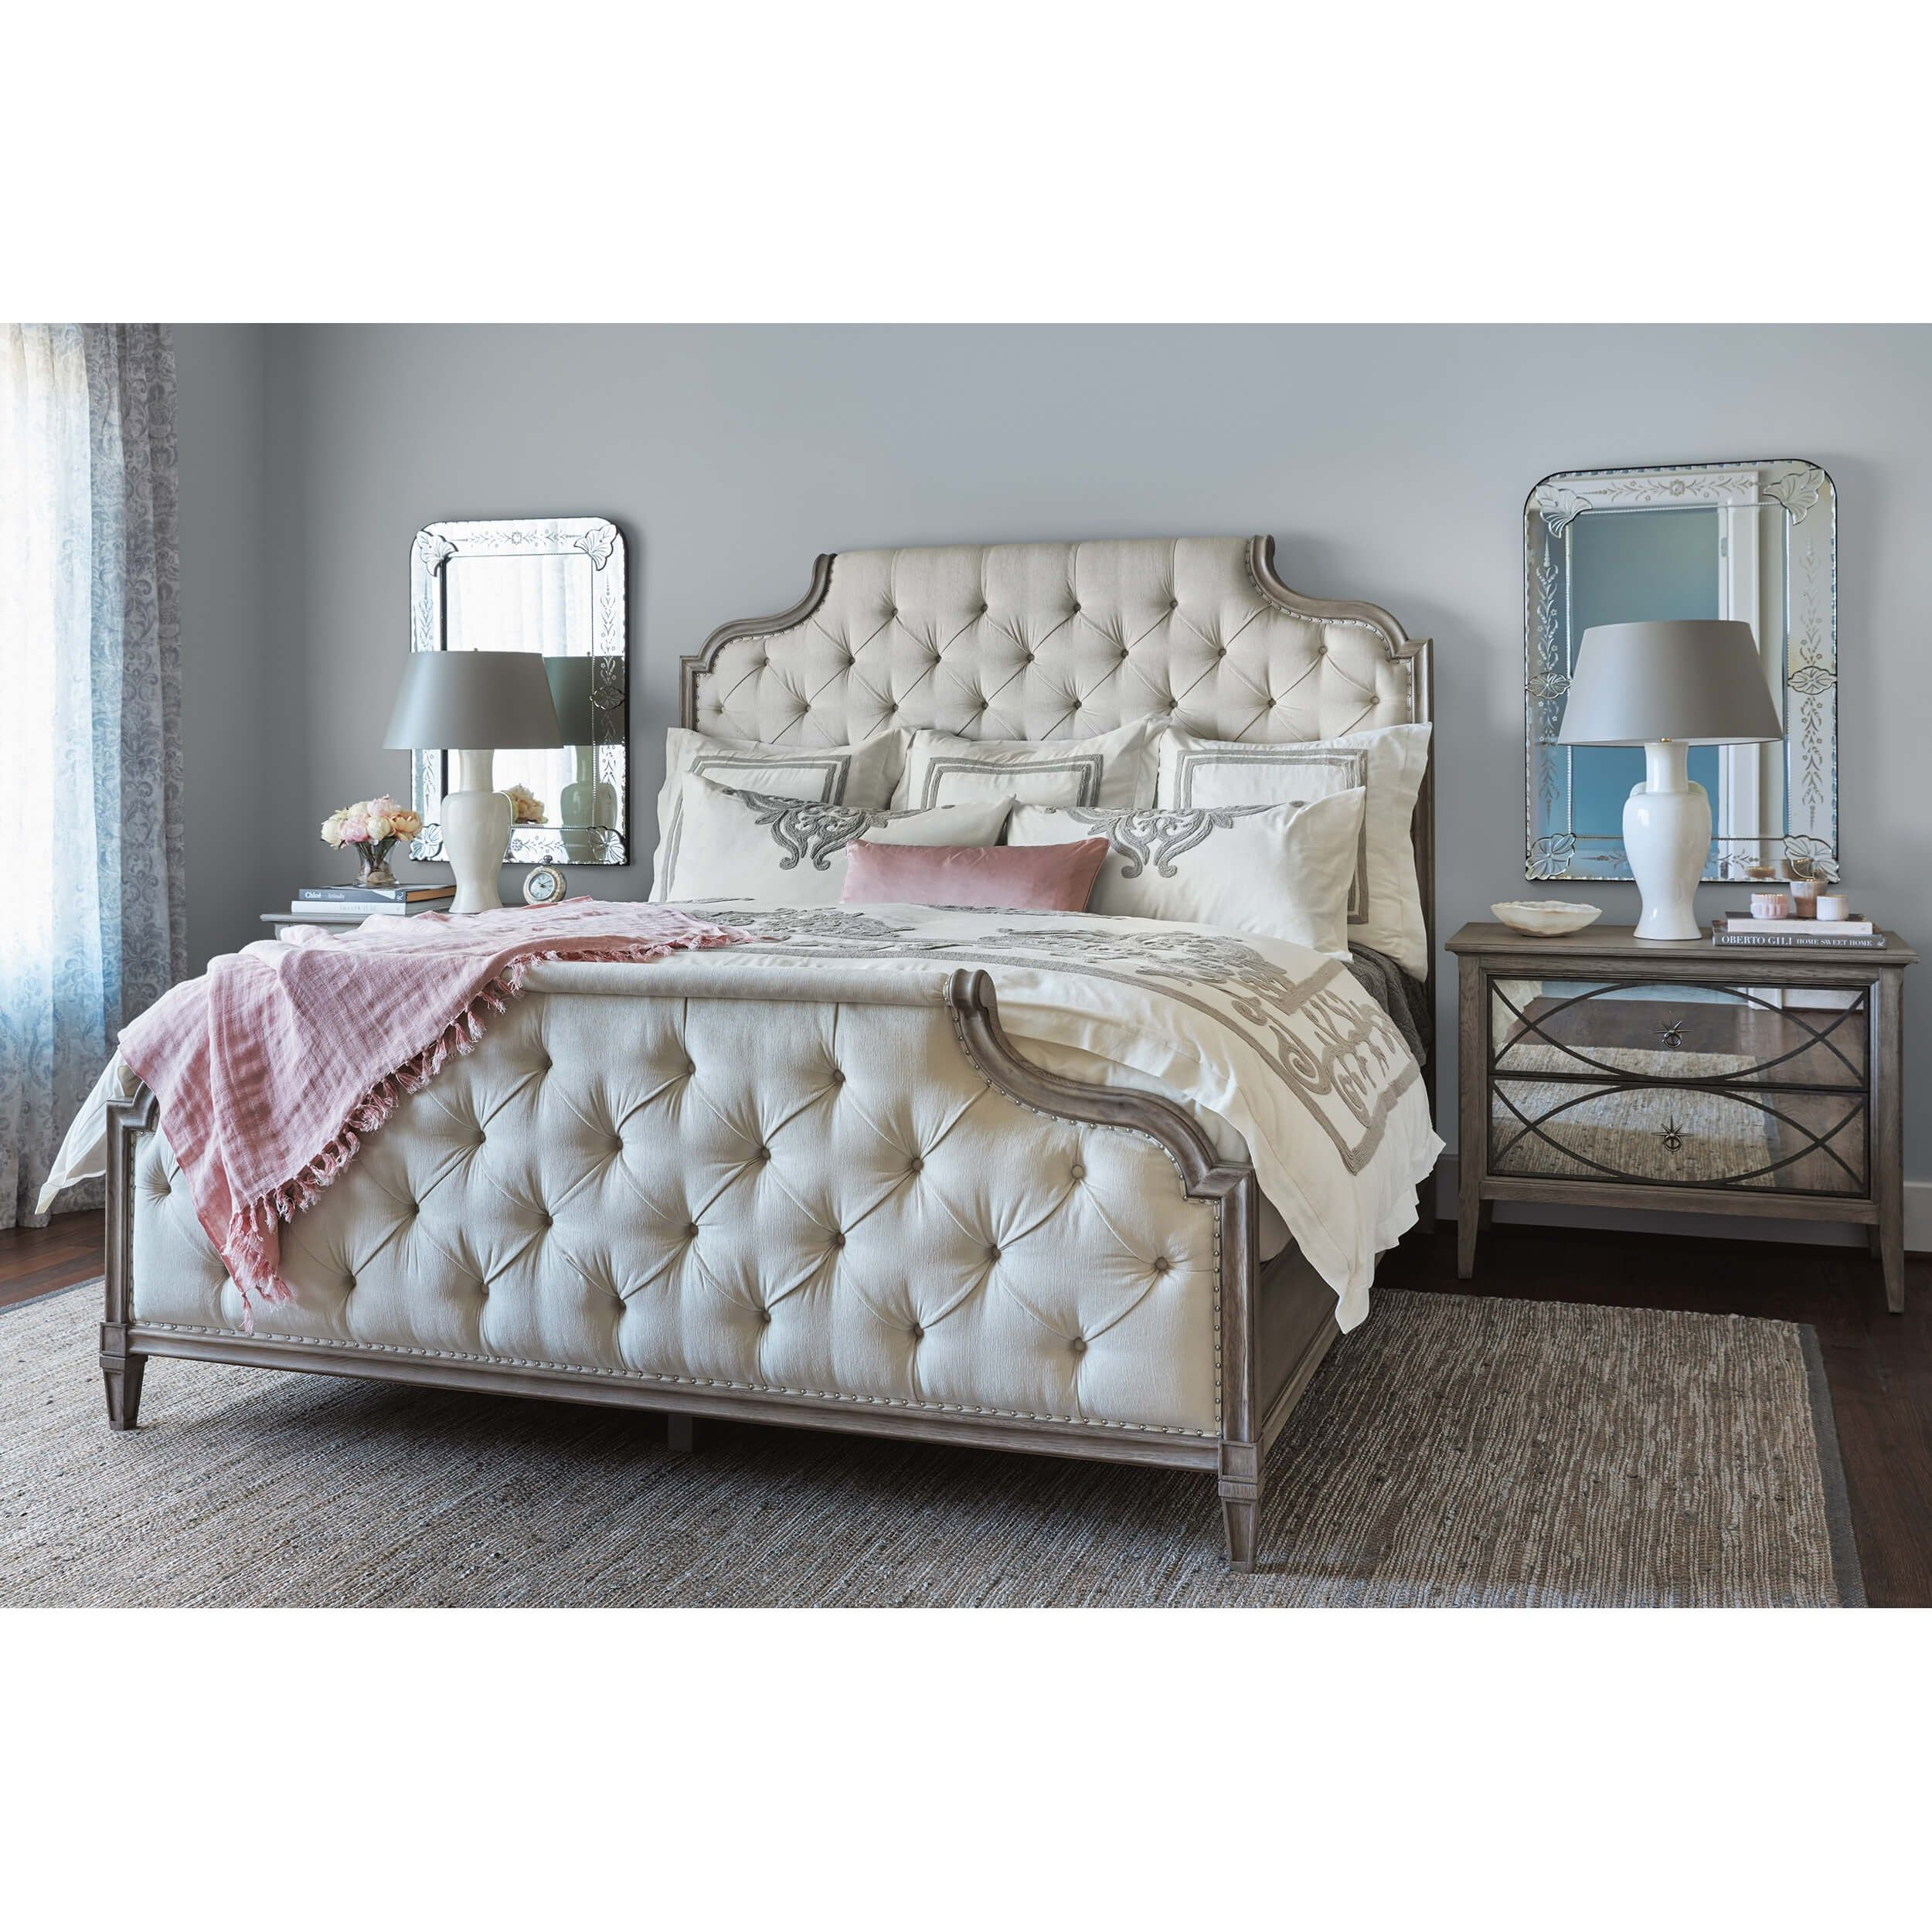 Room Store Bedroom Furniture: Marquesa Upholstered Bed - Queen